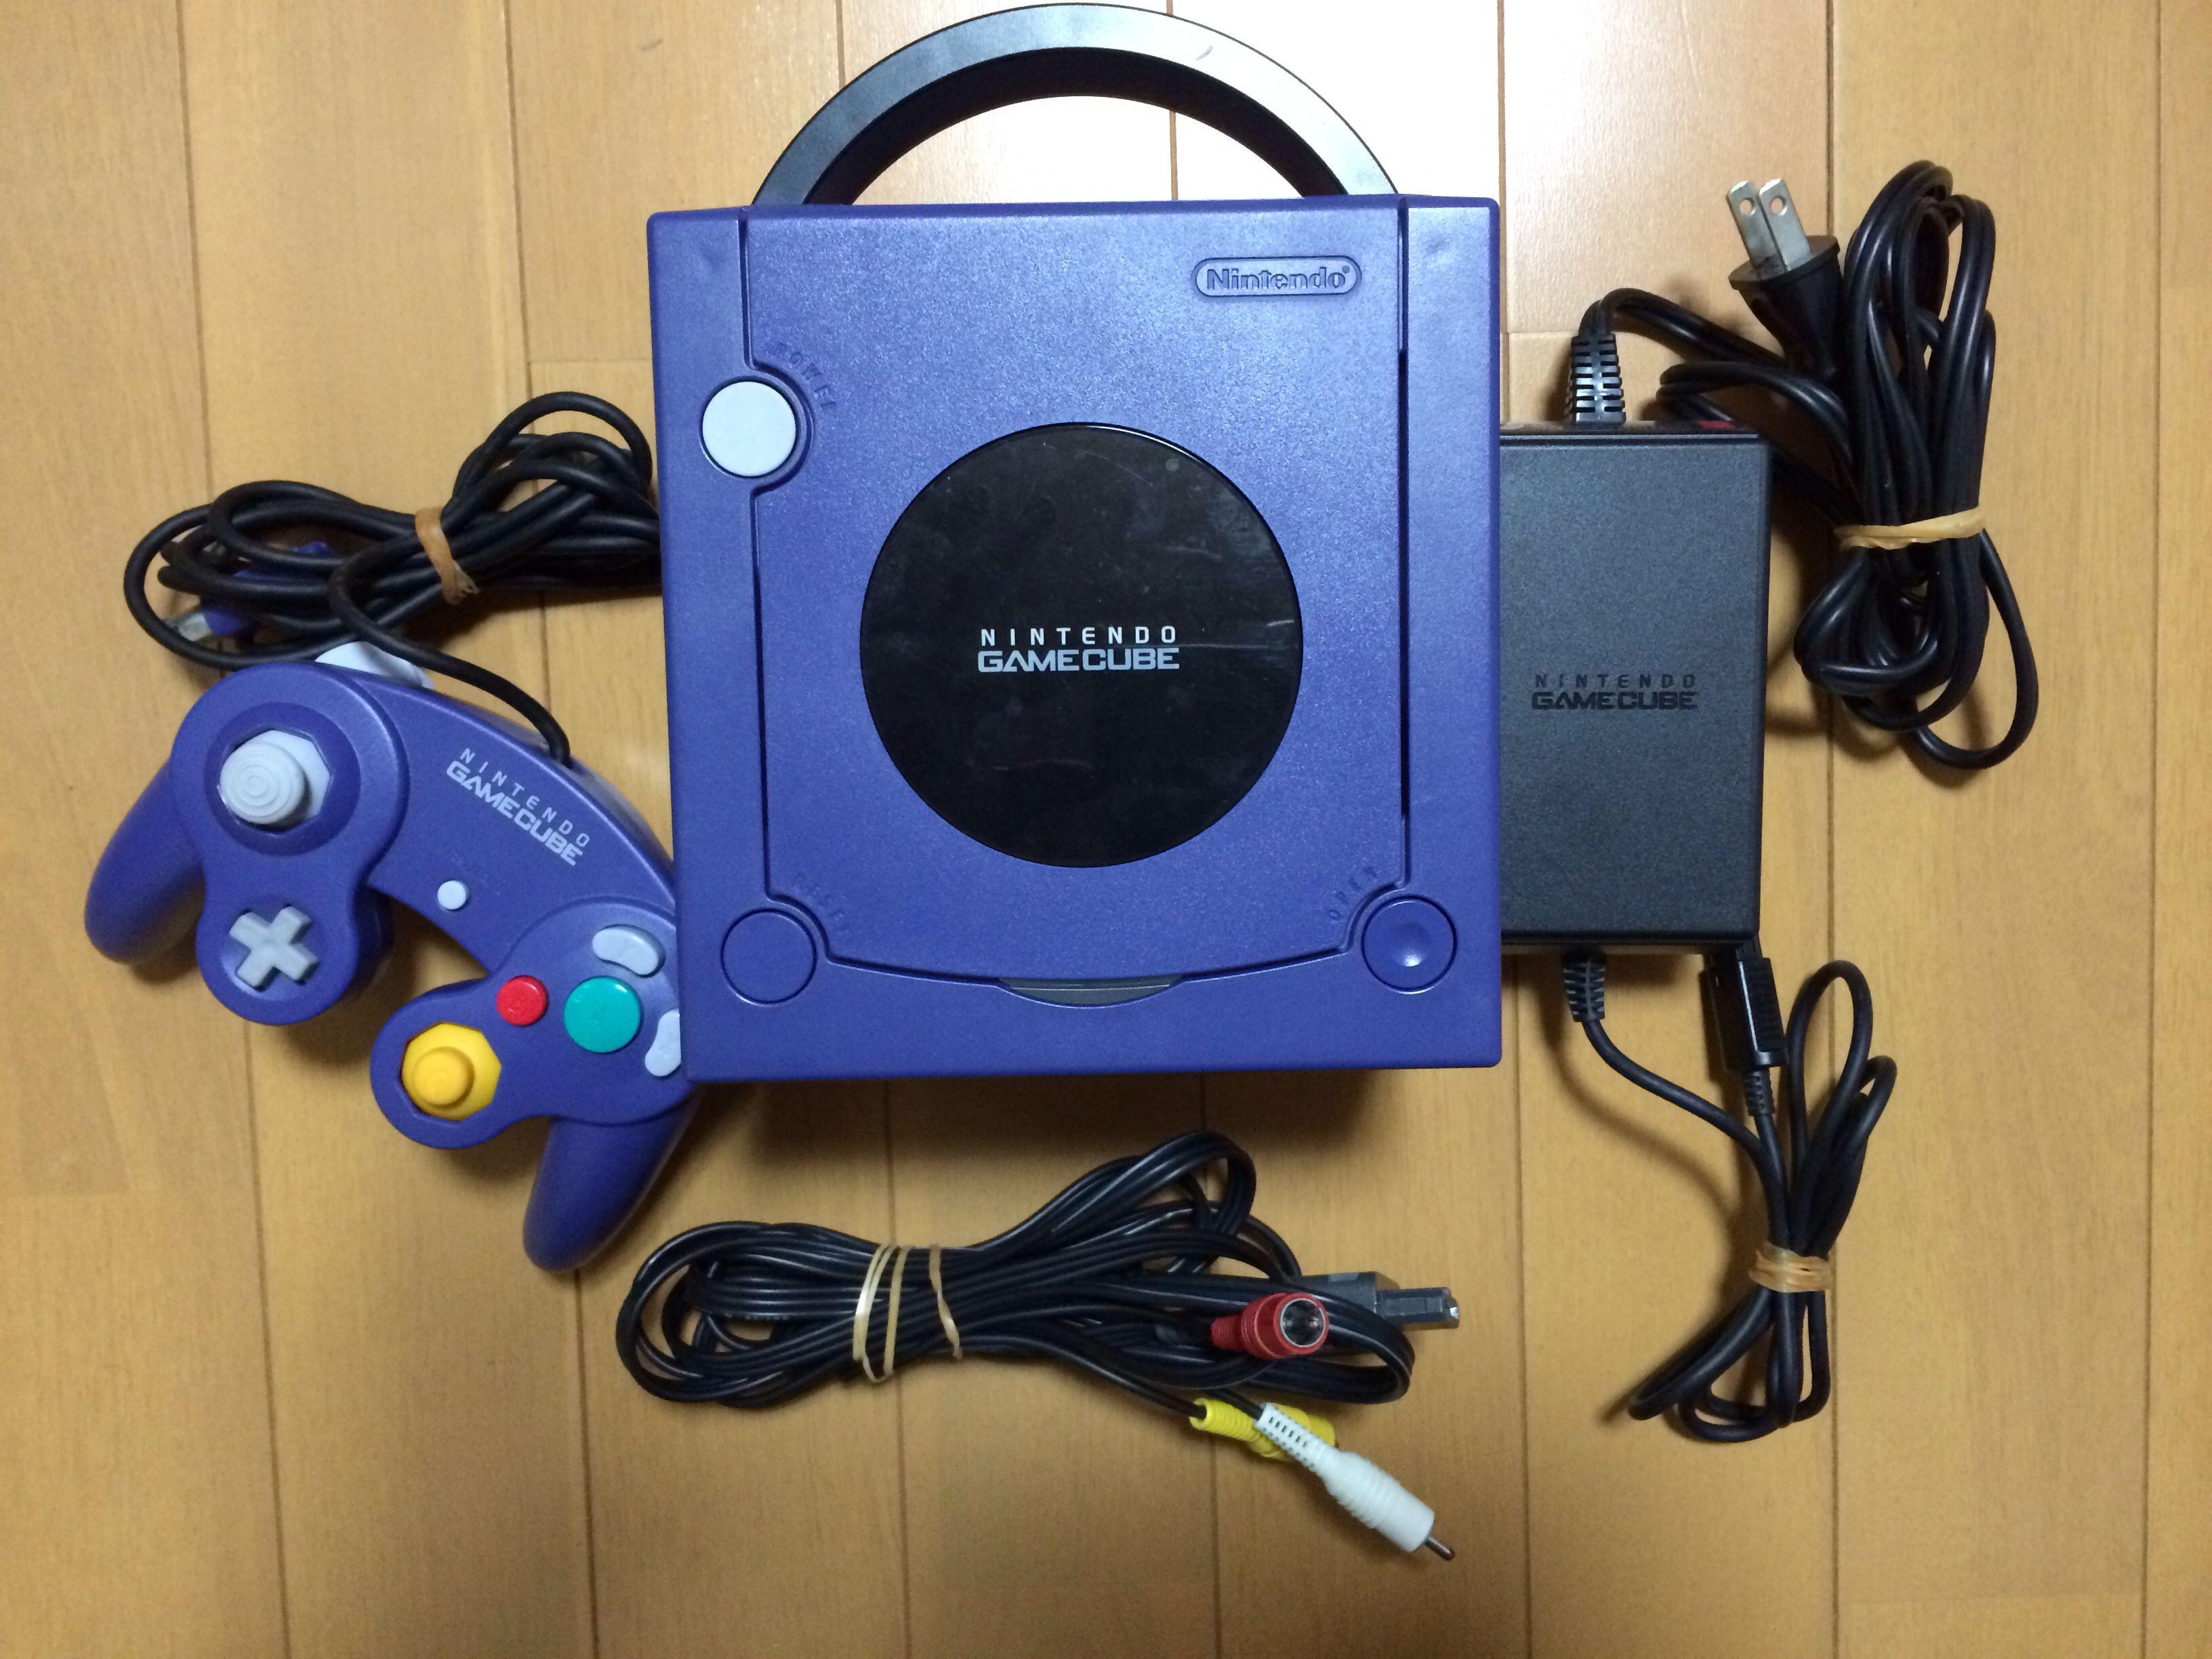 The Standard GameCube console set